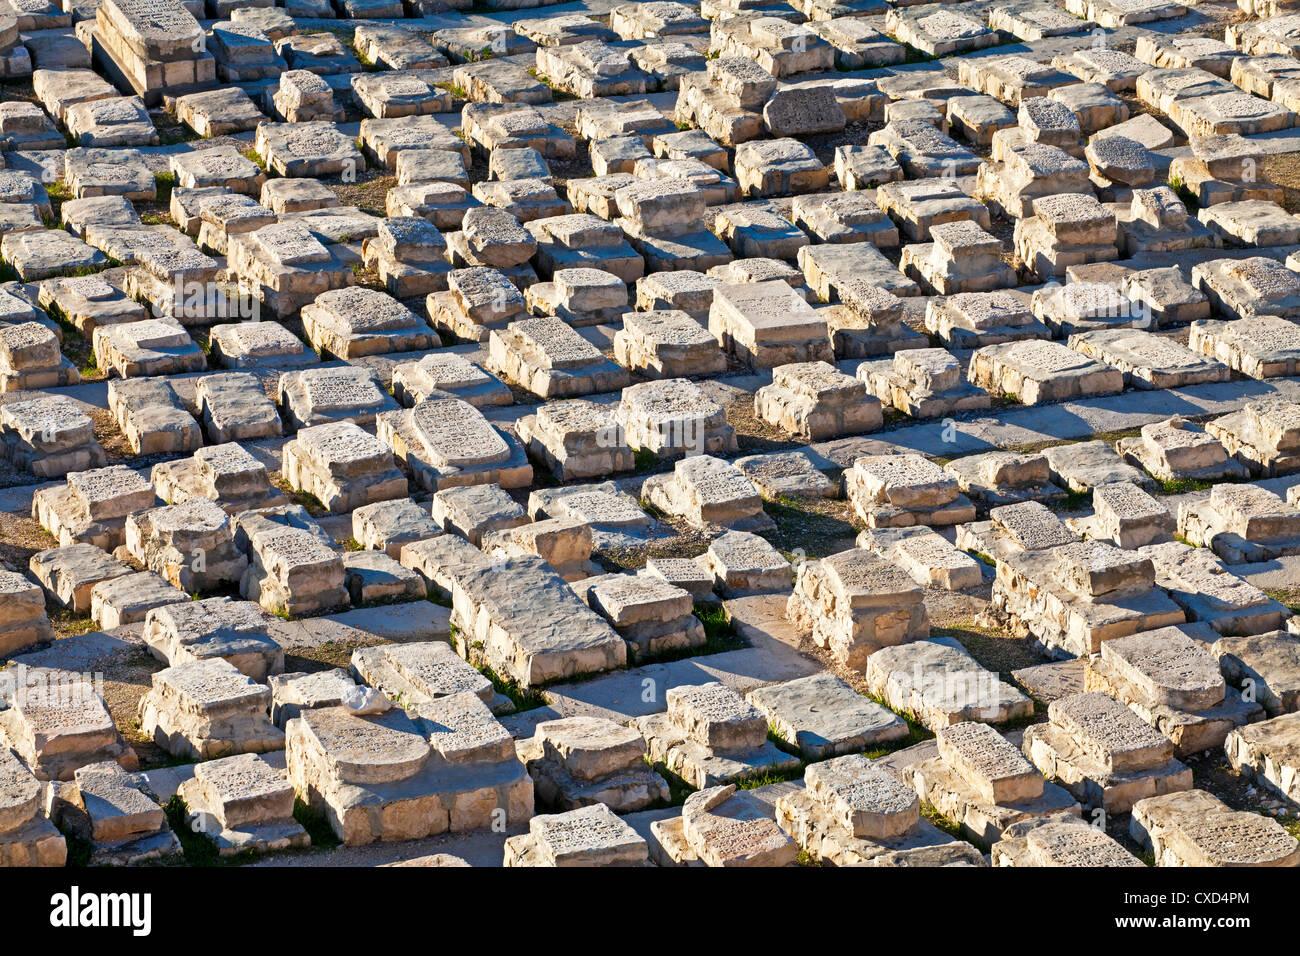 Jewish cemetery, Mount of Olives, Jerusalem, Israel, Middle East Stock Photo